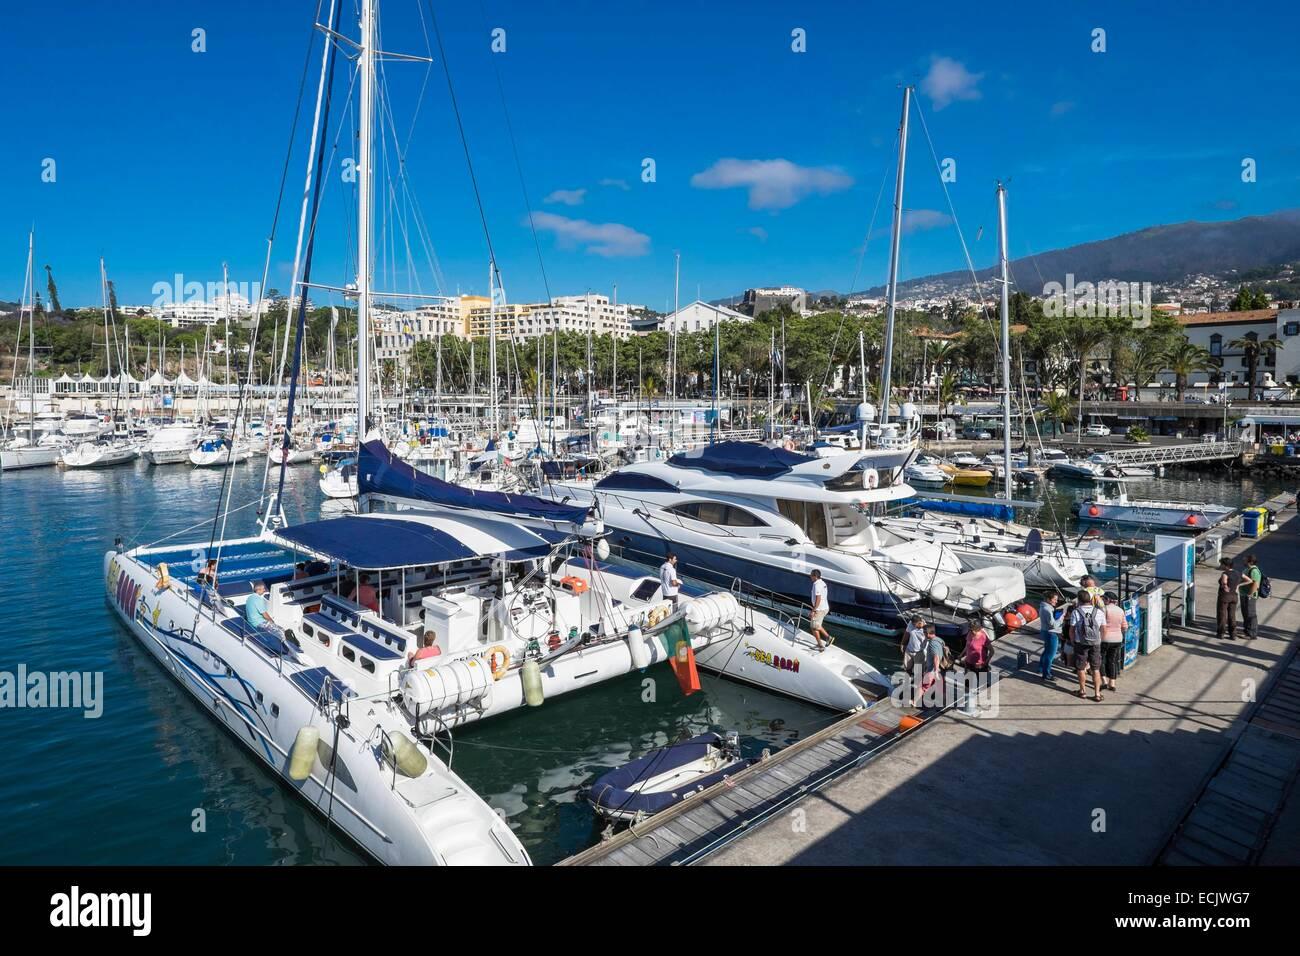 Portugal, Madeira island, Funchal, the marina - Stock Image